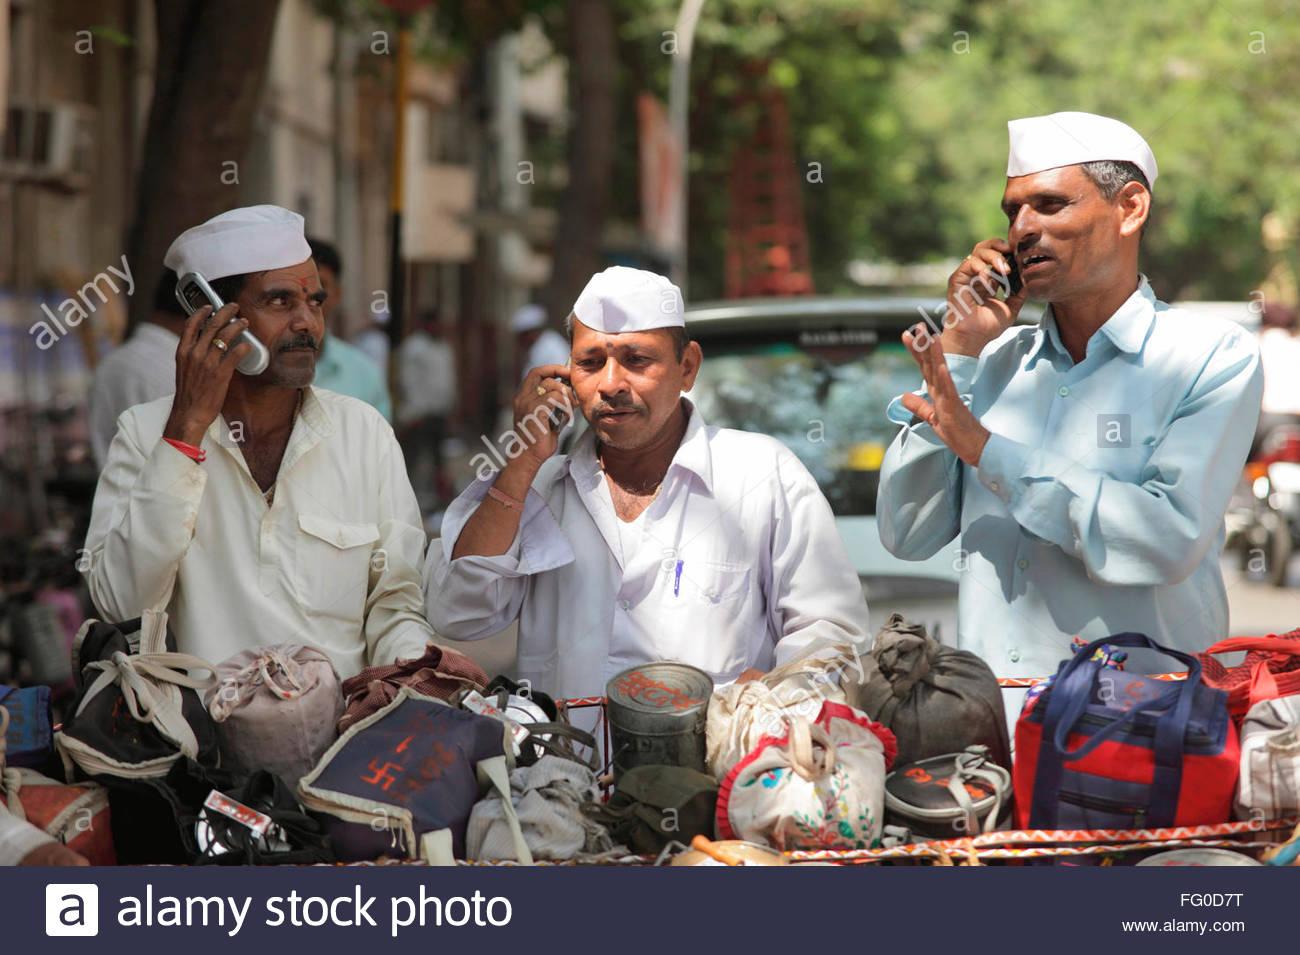 Indian dabbawala dabbawalla tiffin carrier talking on mobile at work of providing lunch boxes ; Bombay Mumbai Maharashtra  sc 1 st  Alamy & Indian dabbawala dabbawalla tiffin carrier talking on mobile at ... Aboutintivar.Com